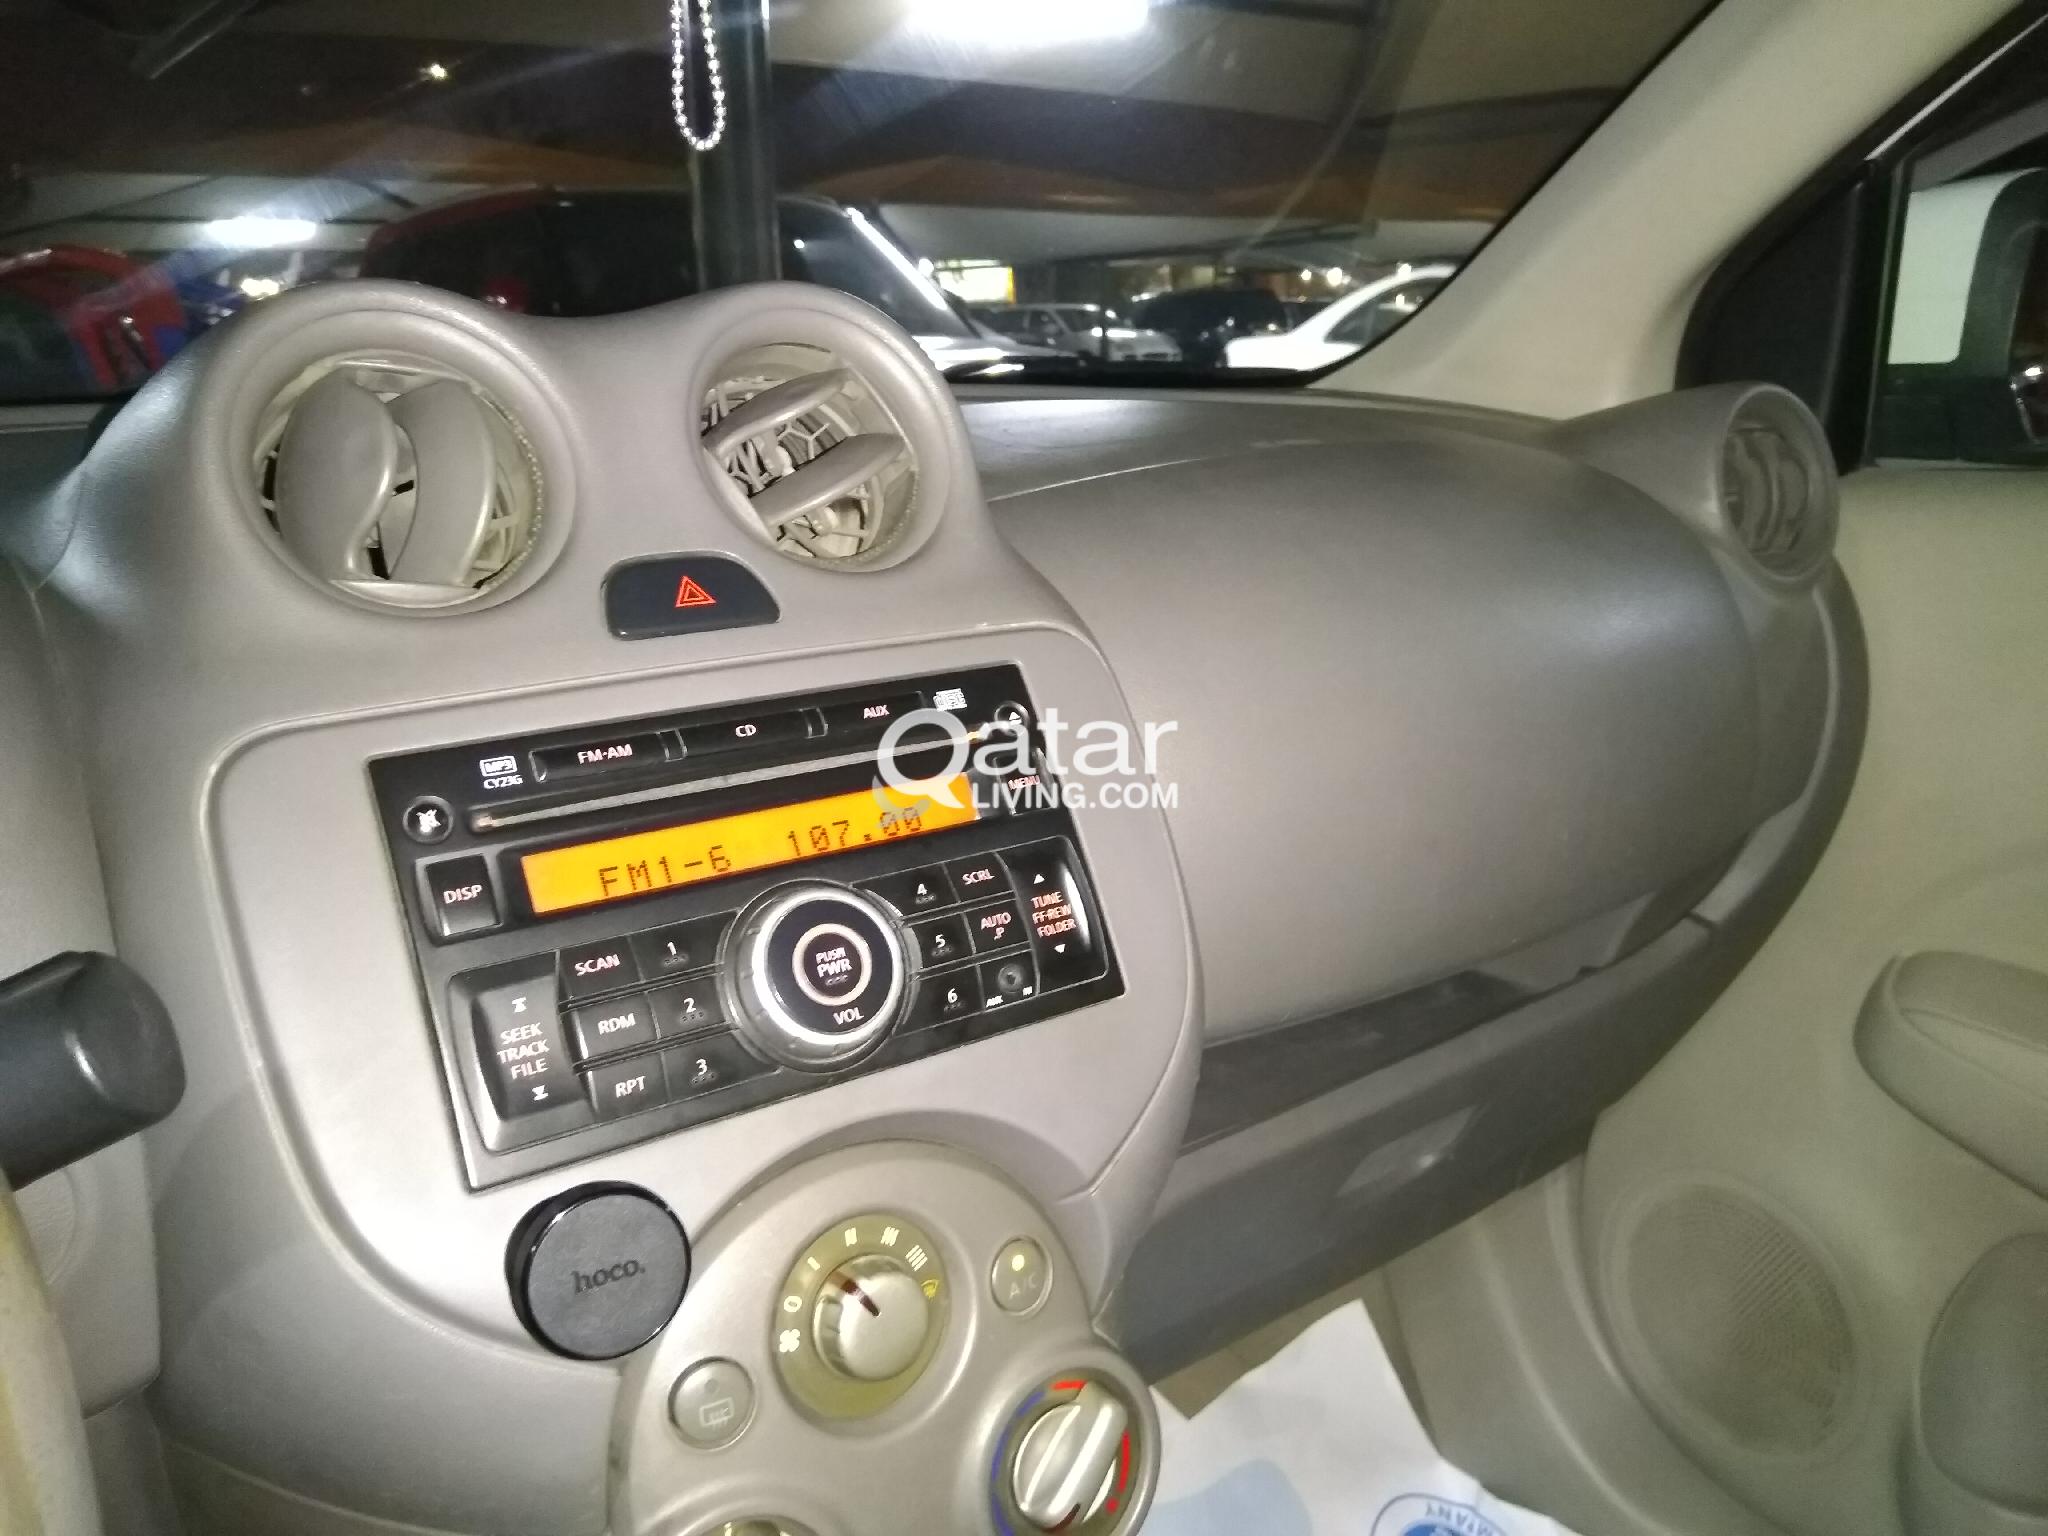 Nissan sunny kilometer 214022